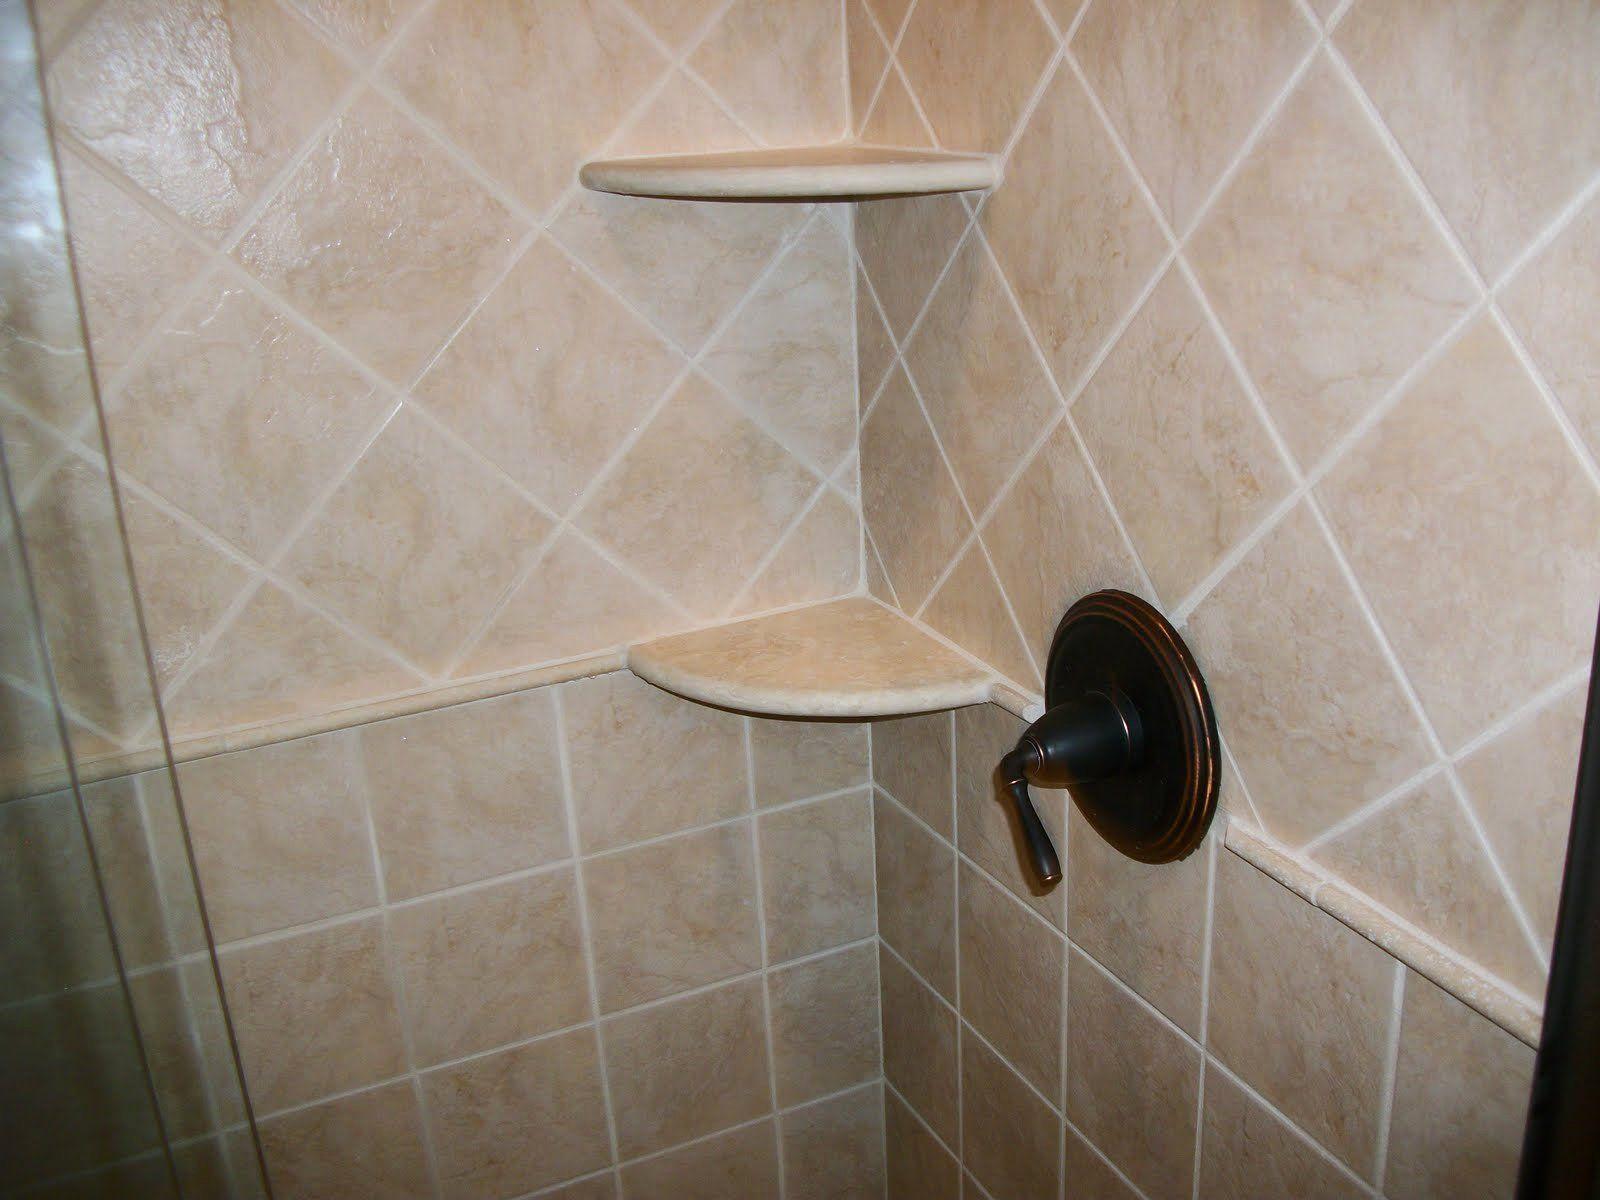 24 Bathroom Corner Shelf Ideas in 2020 | Shower tile ...